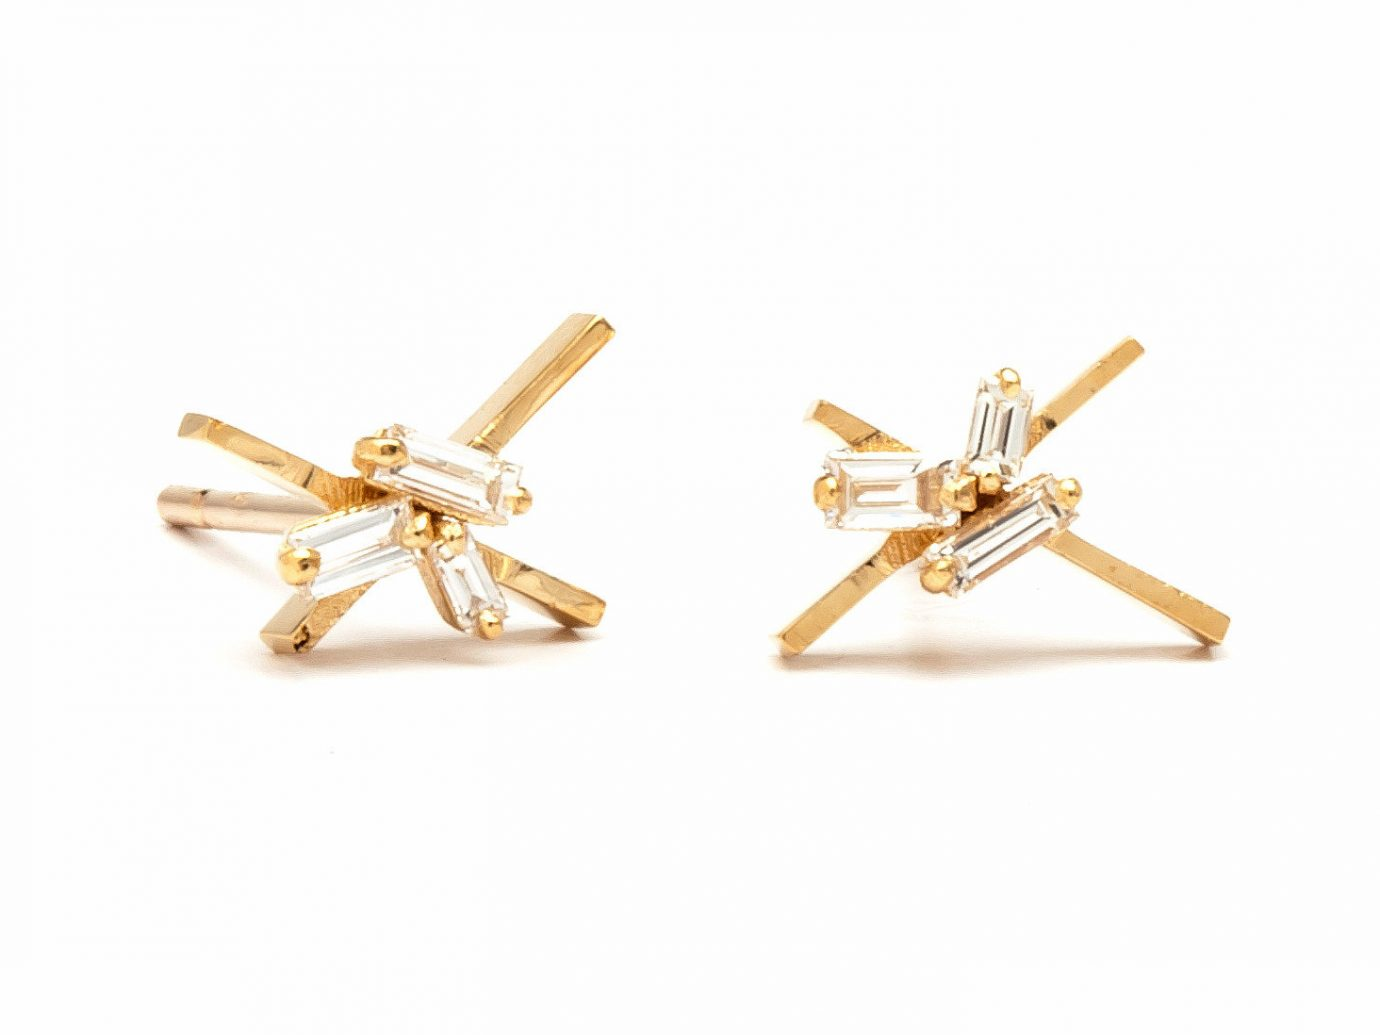 Style + Design jewellery earrings fashion accessory old body jewelry diamond cufflink material metal brass